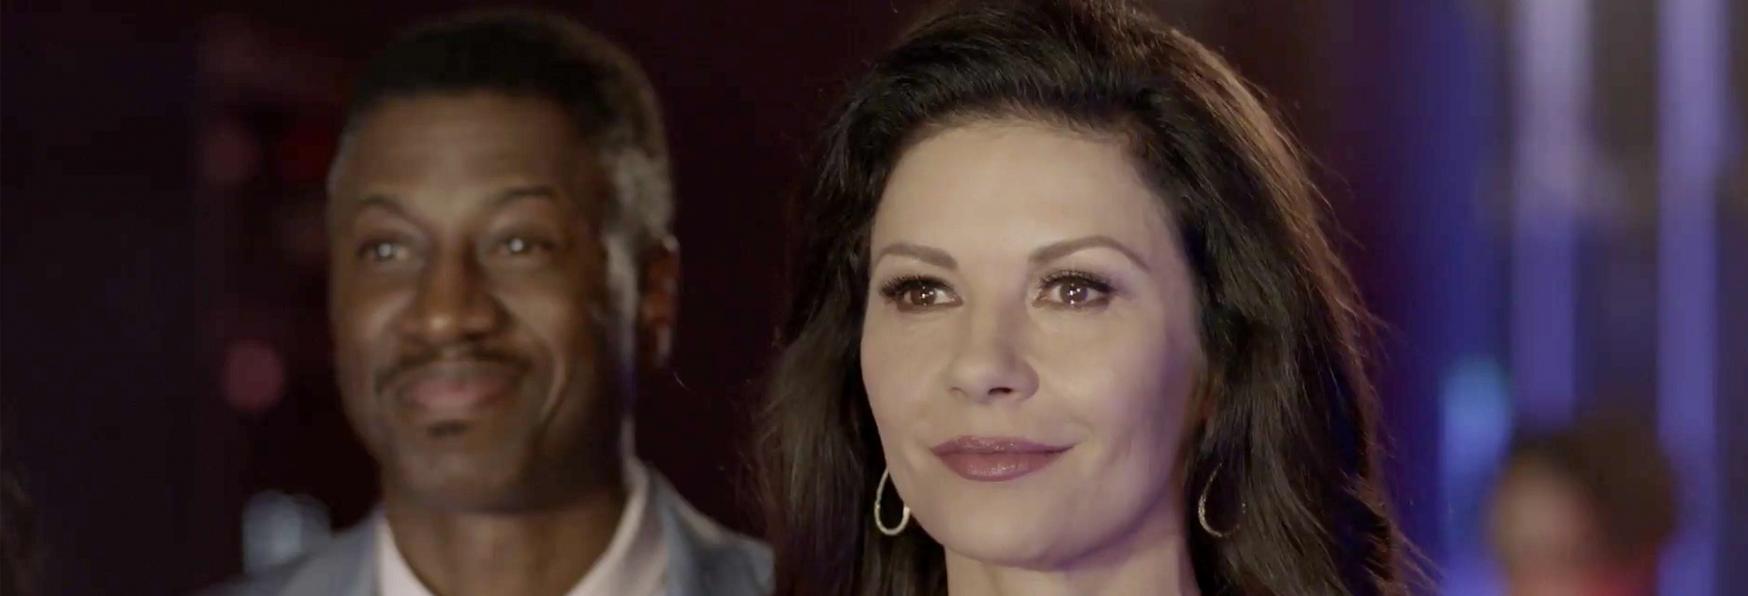 Wednesday: Catherine Zeta-Jones sarà Morticia Addams nella Serie TV targata Netflix